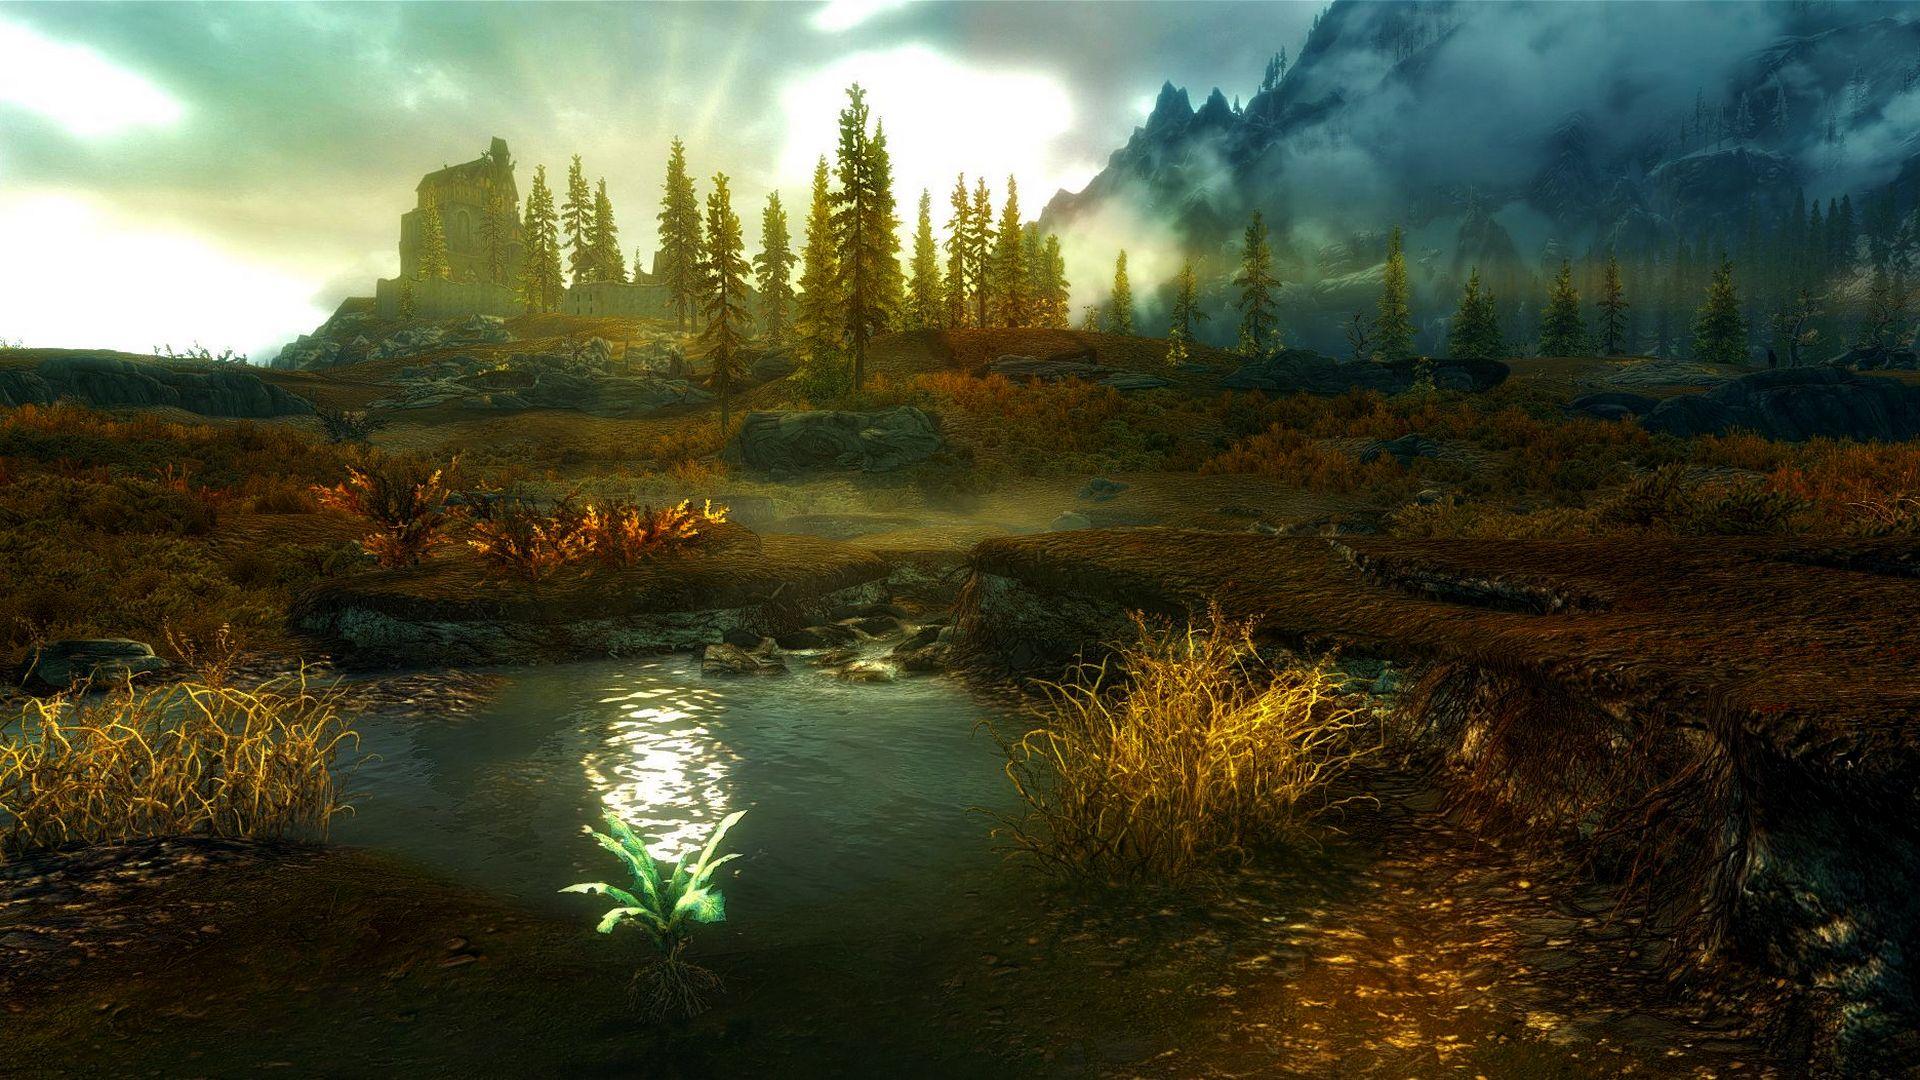 Skyrim Landscape High Quality HD Wallpaper 3d0f2